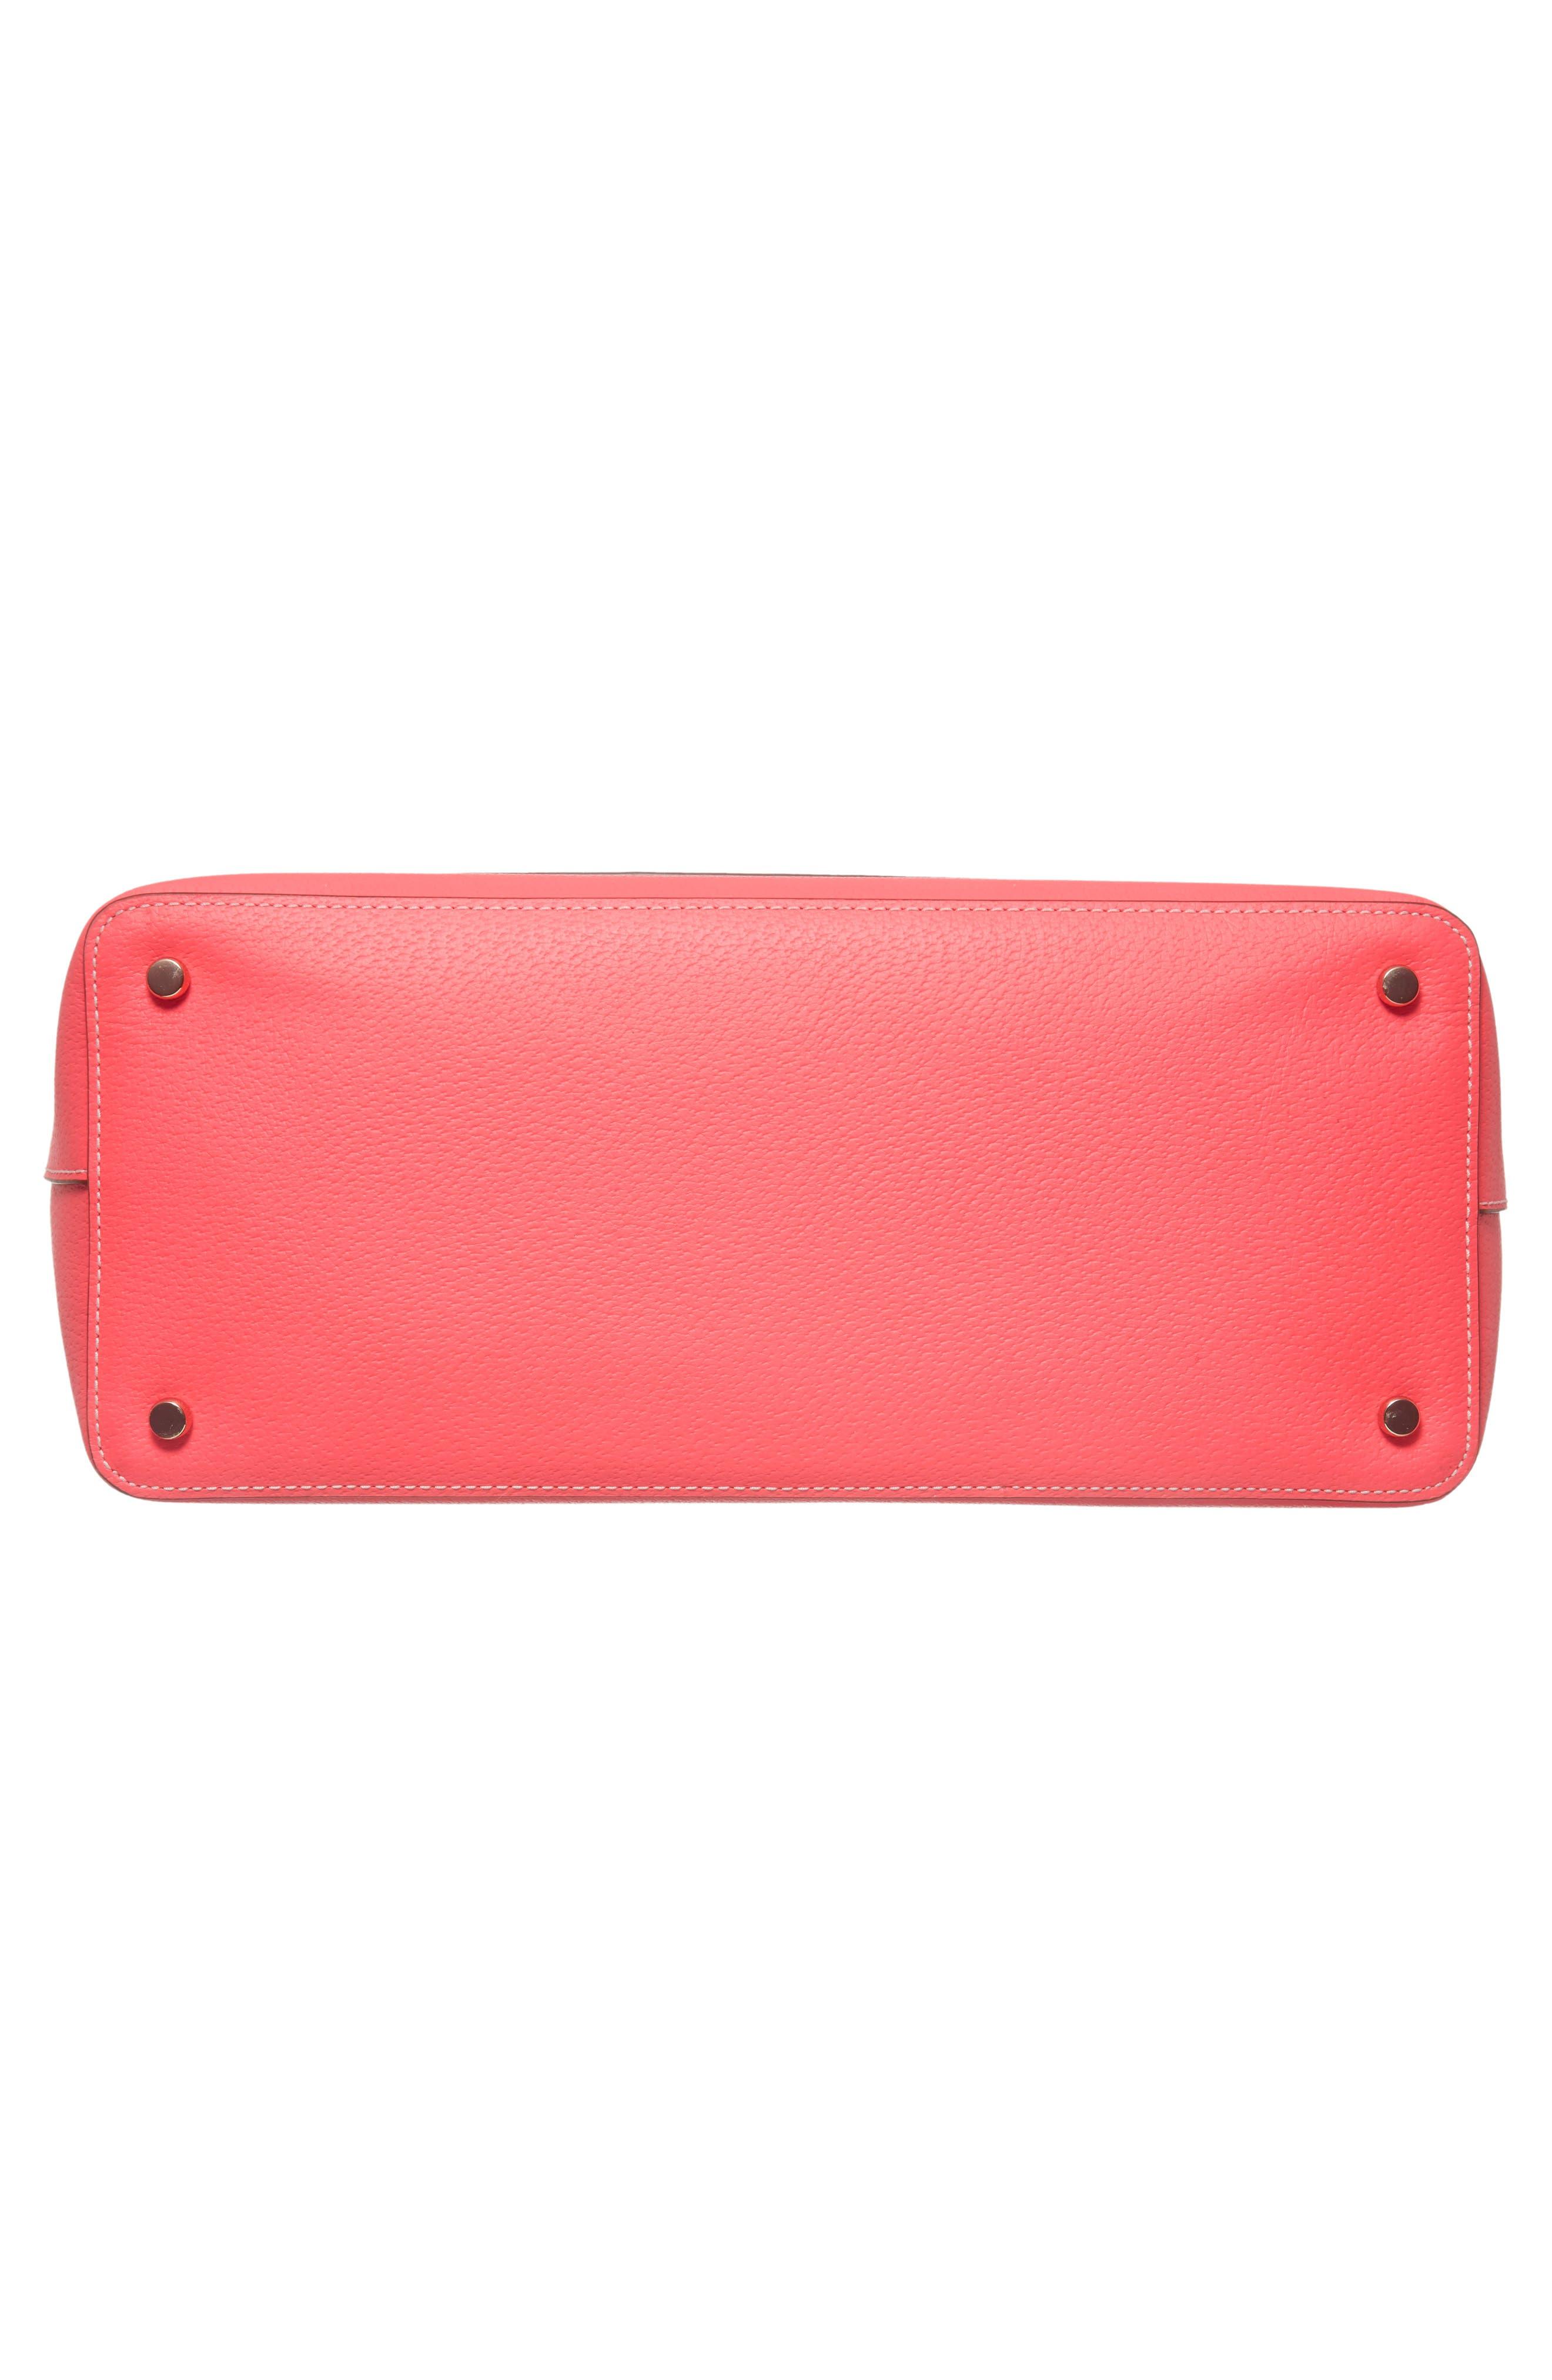 thompson street - kimberly leather tote,                             Alternate thumbnail 5, color,                             Bright Flamingo